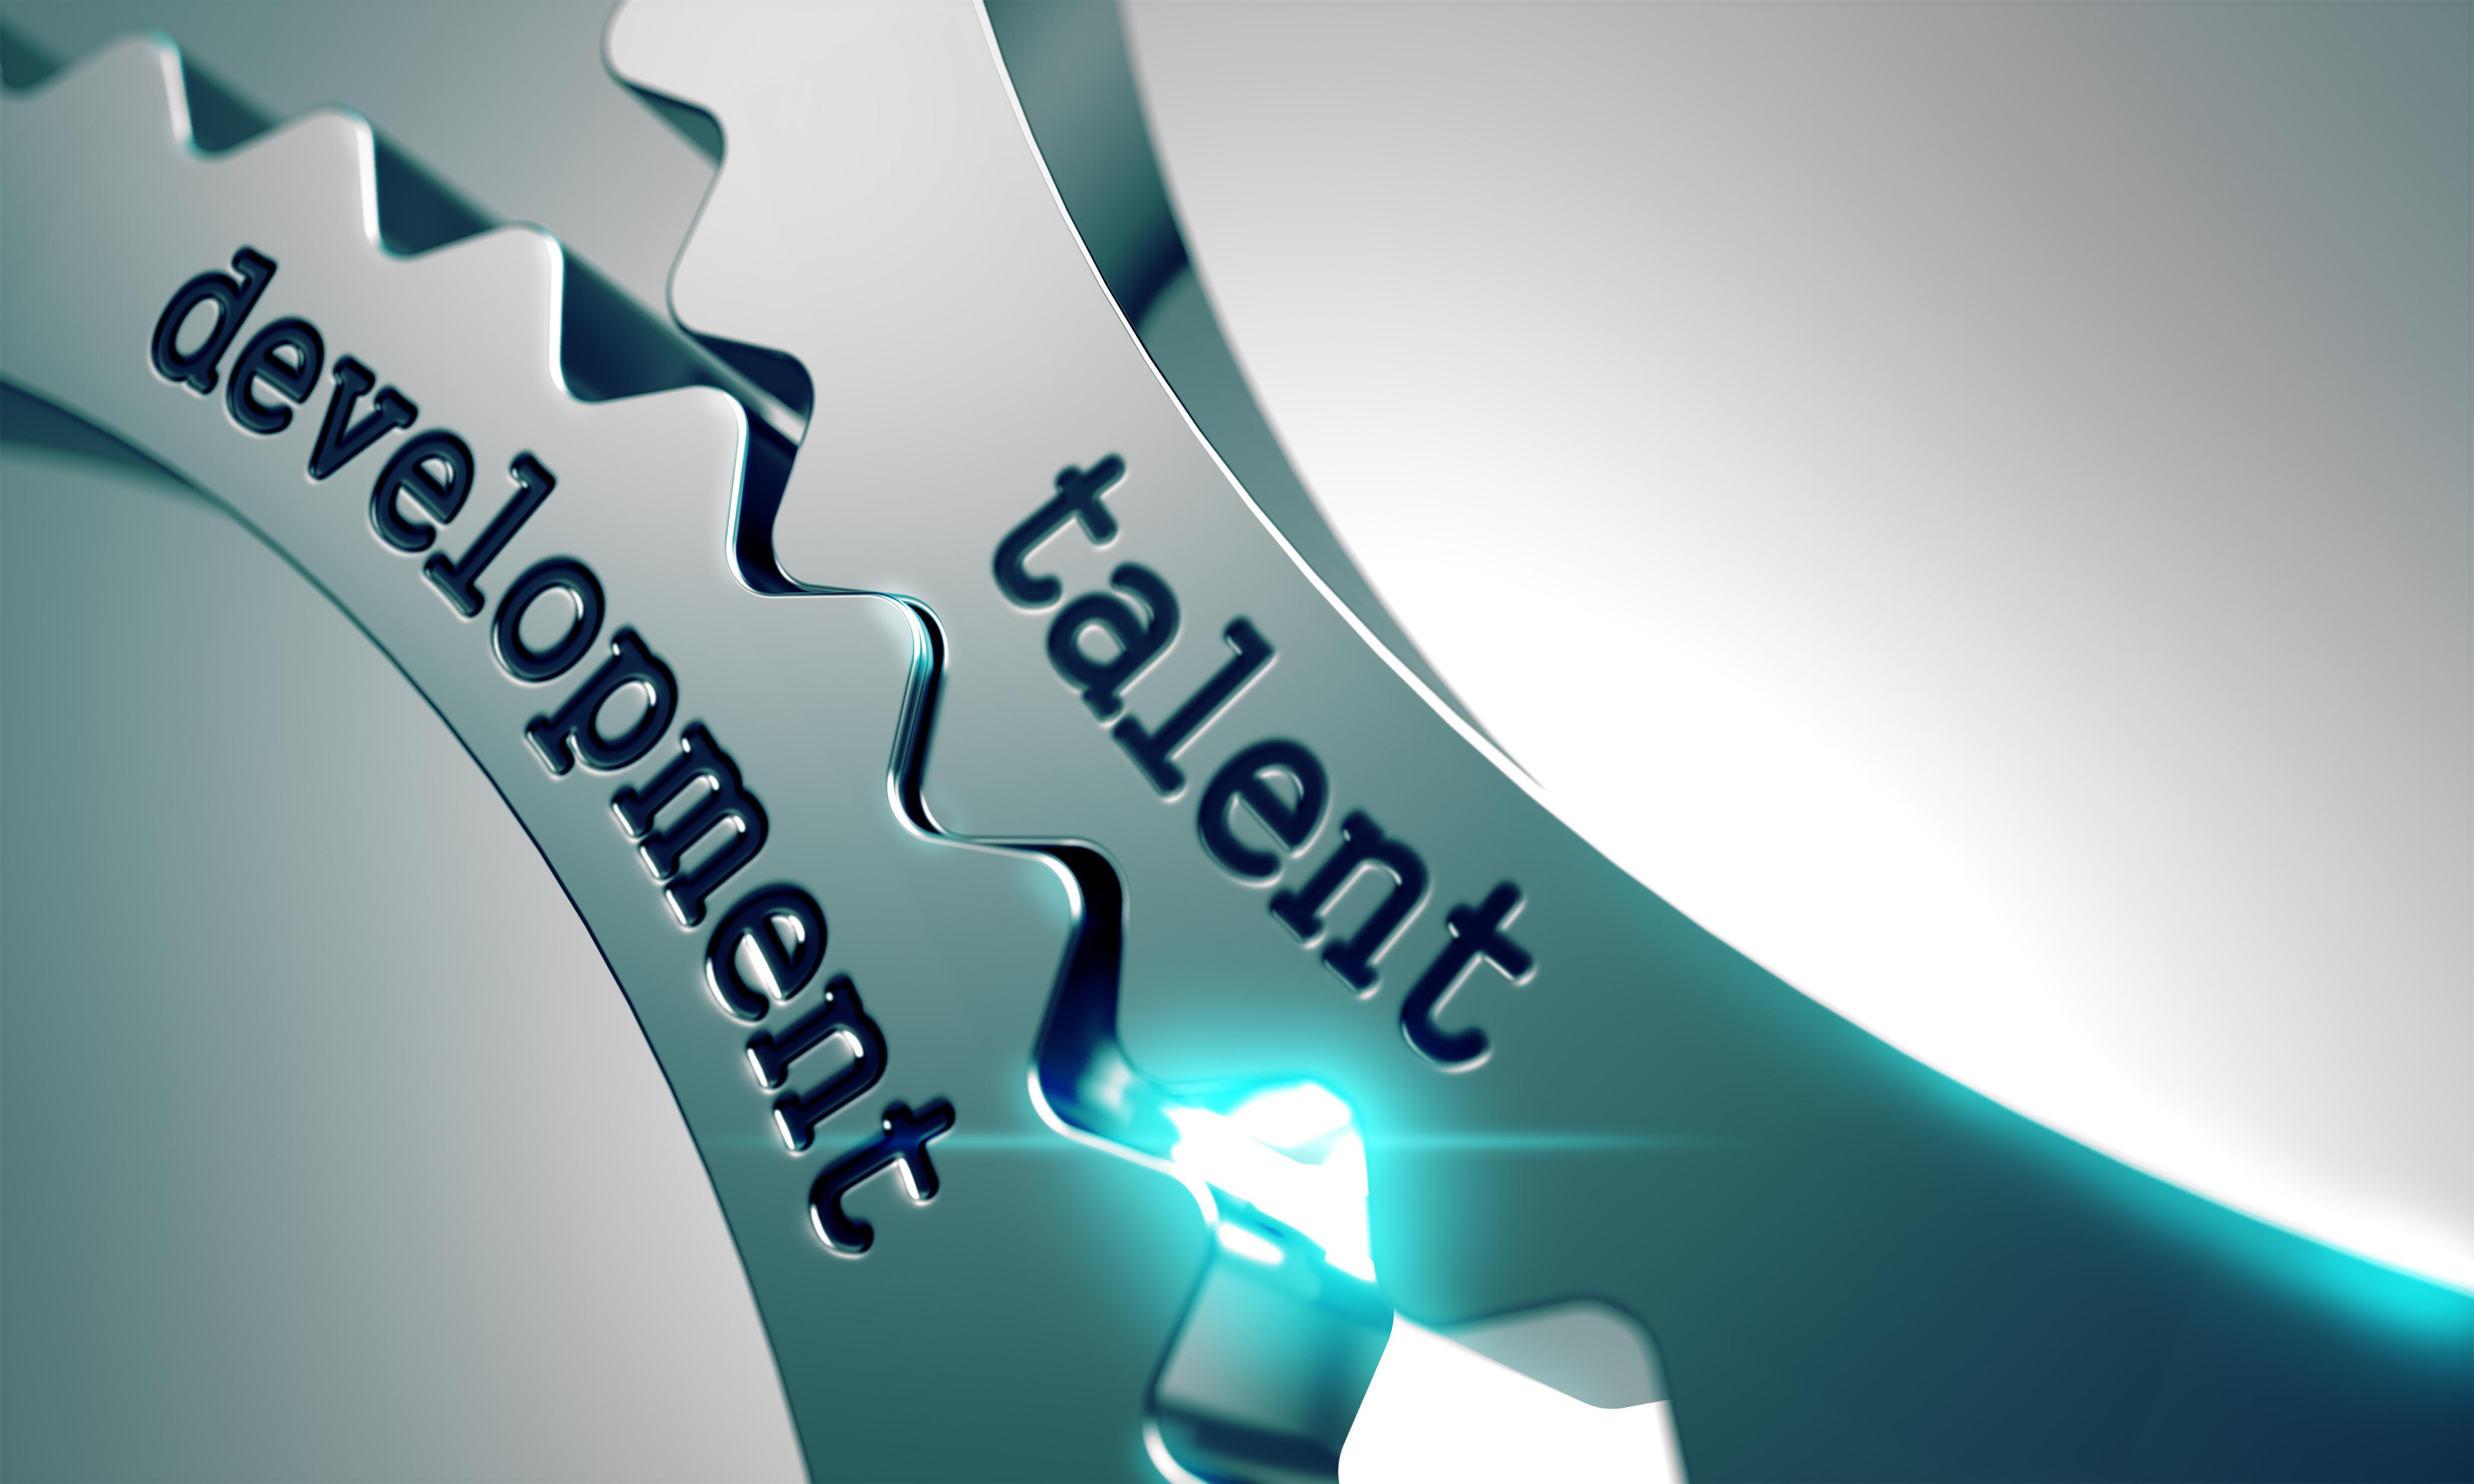 Workforce Analystics is critical for Talent Development